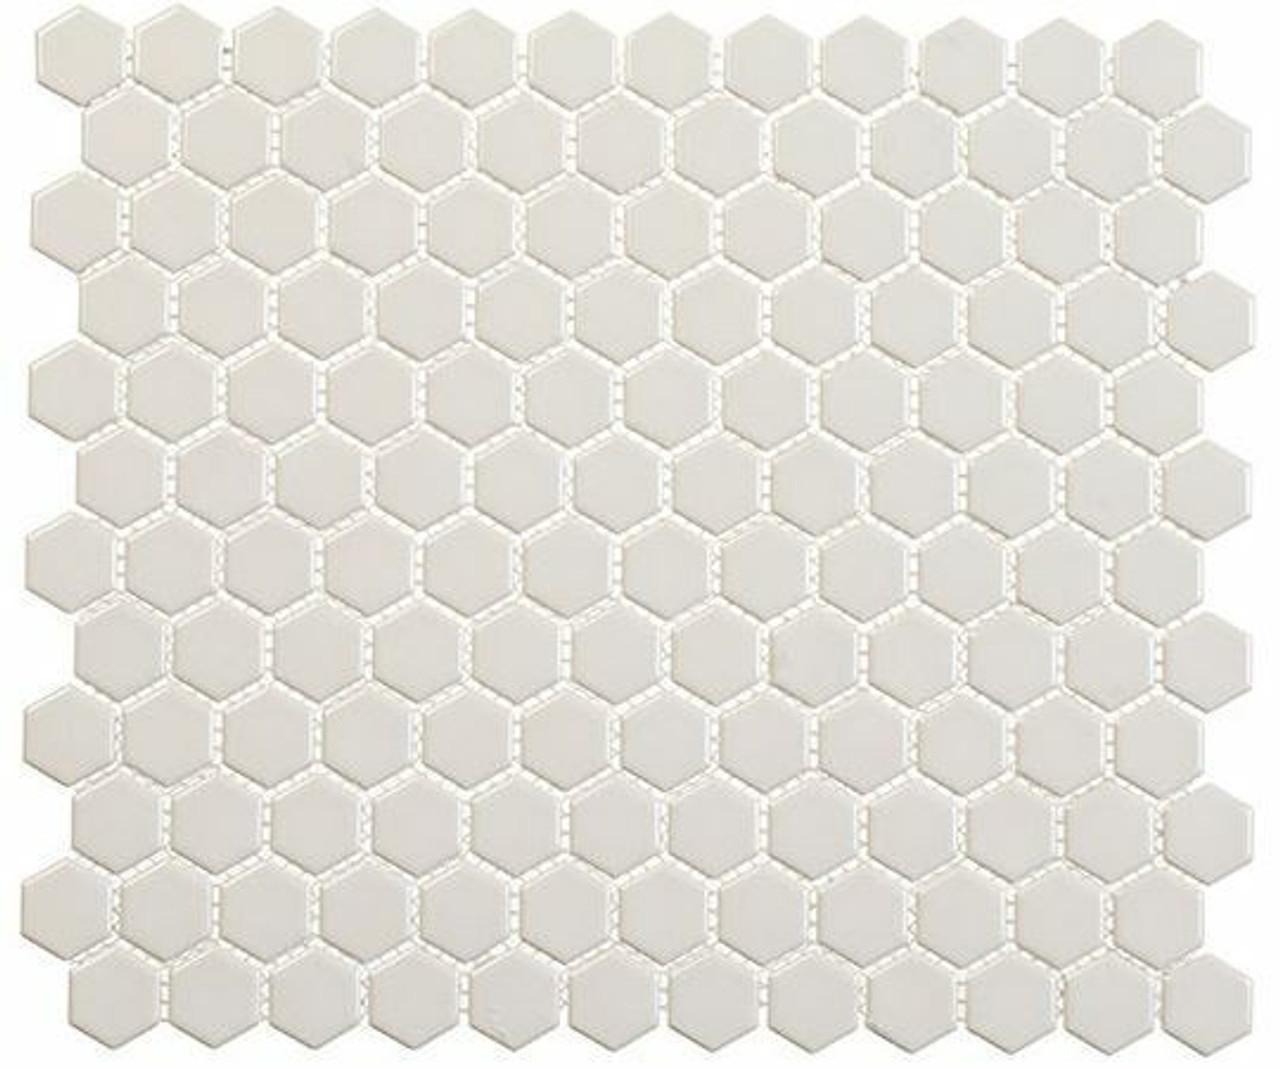 Bella Glass Tiles Freedom Avenue Hexagon Empire Place FDM1812